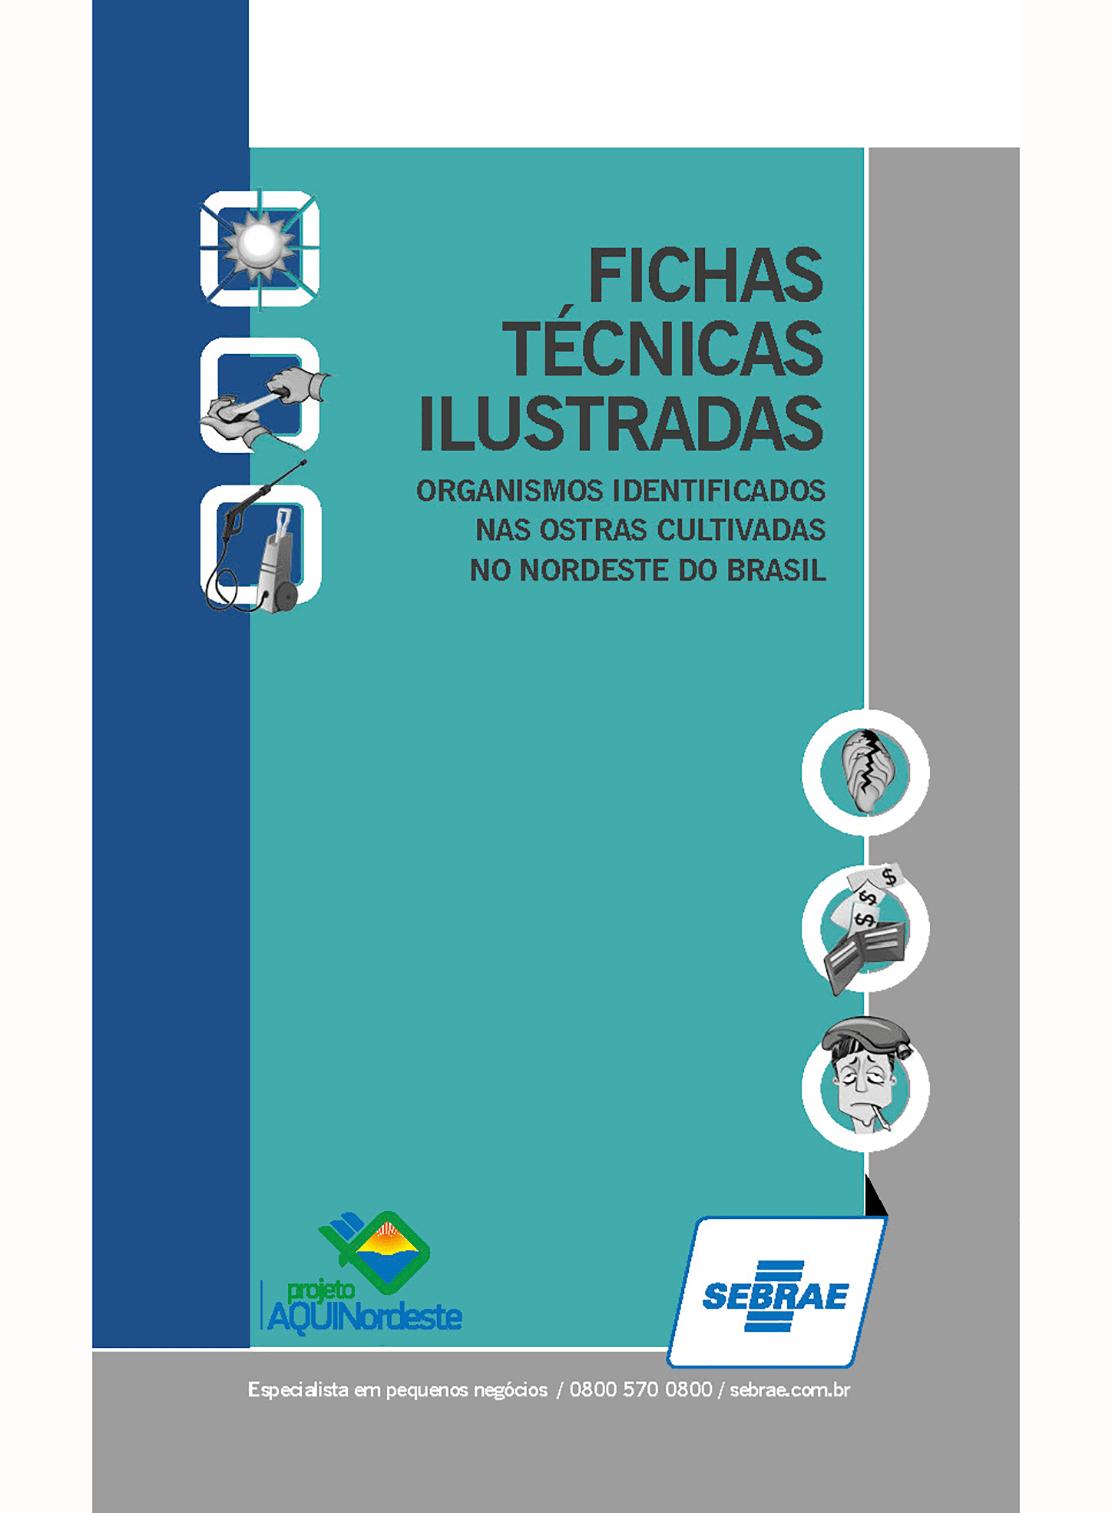 Fichas Técnicas Ilustradas – Sebrae/Projeto AquiNordeste